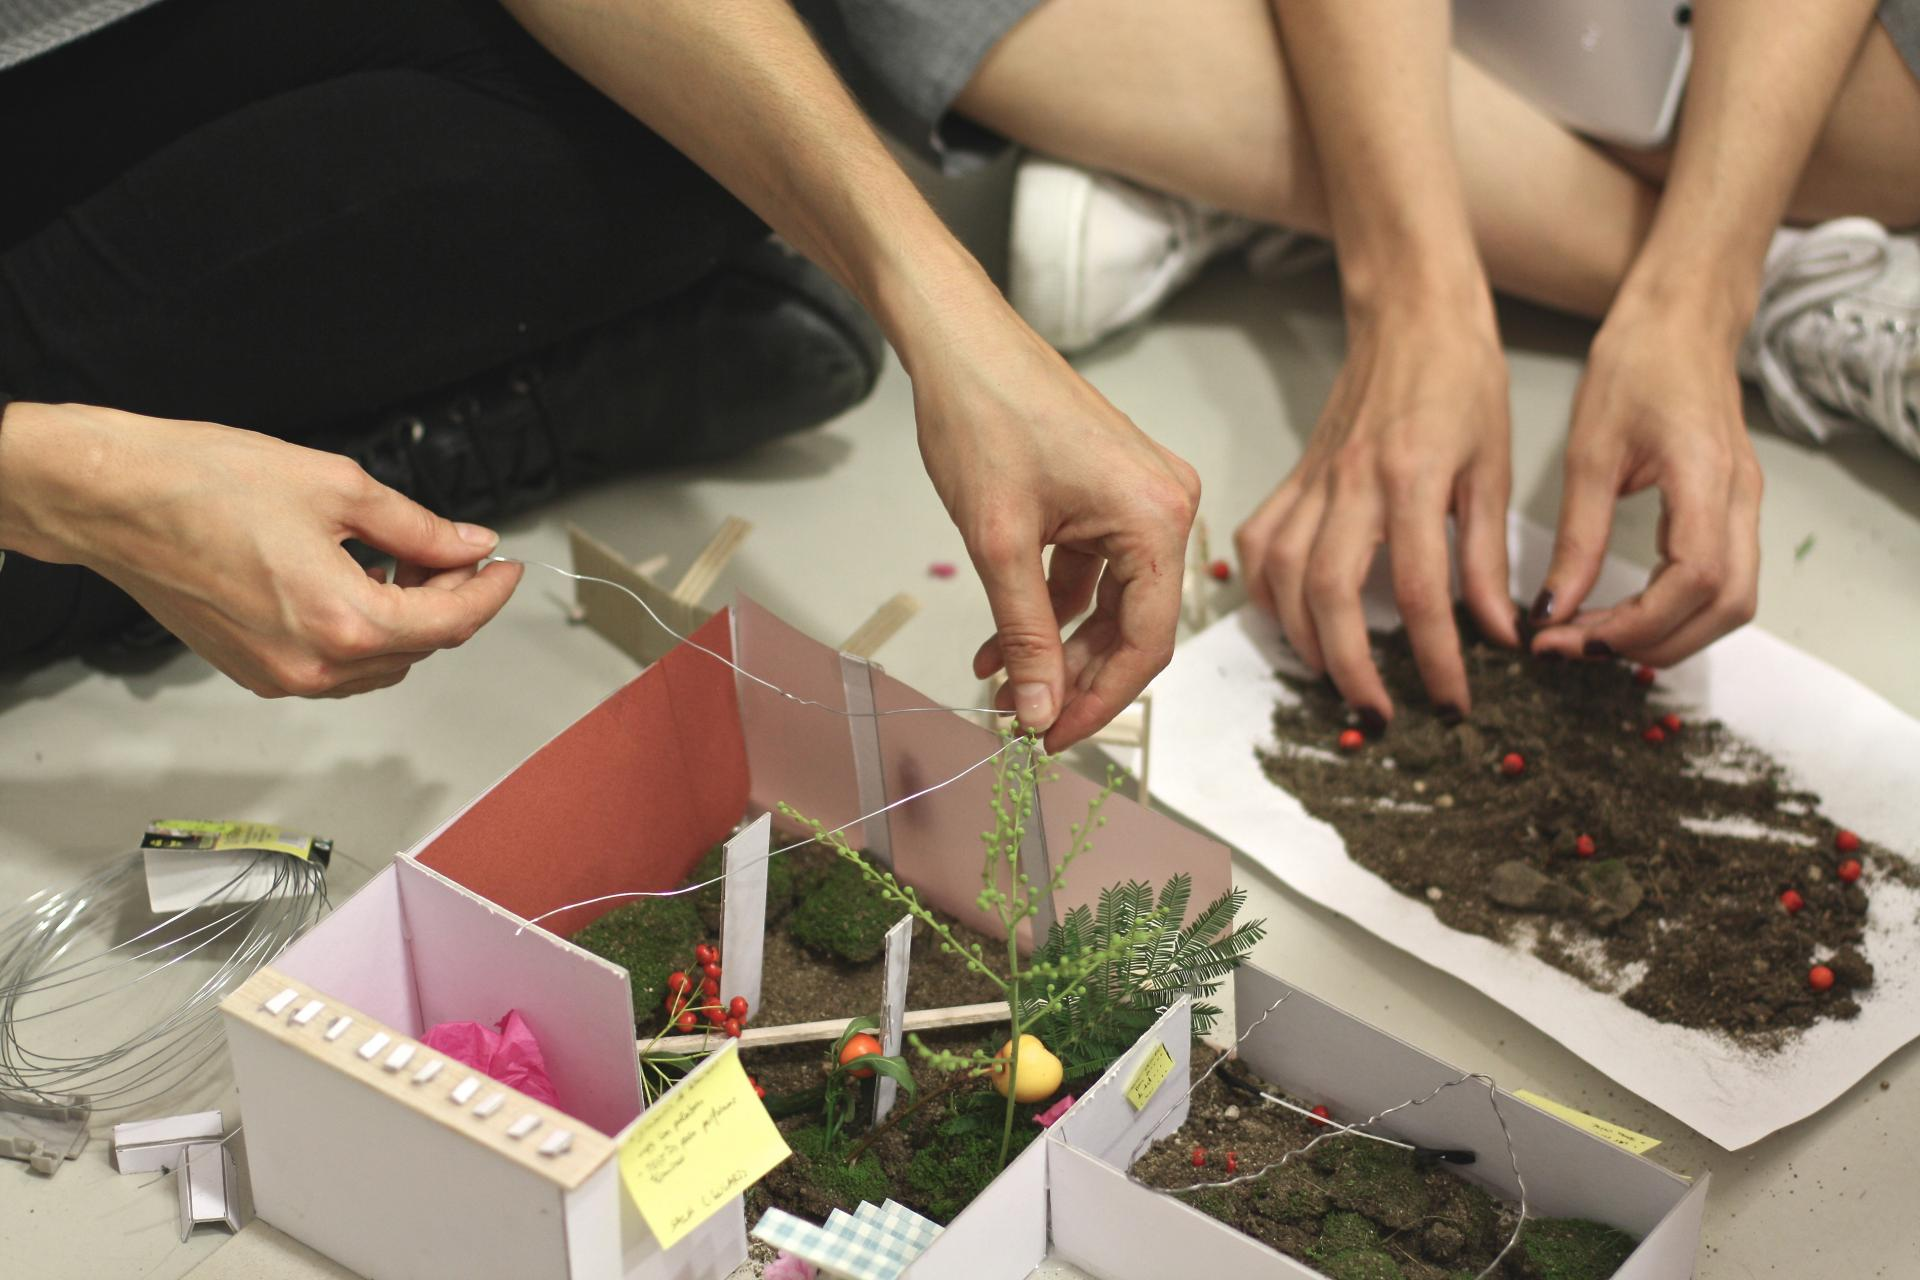 Exposición Casa Abierta. Sala de Arte Joven